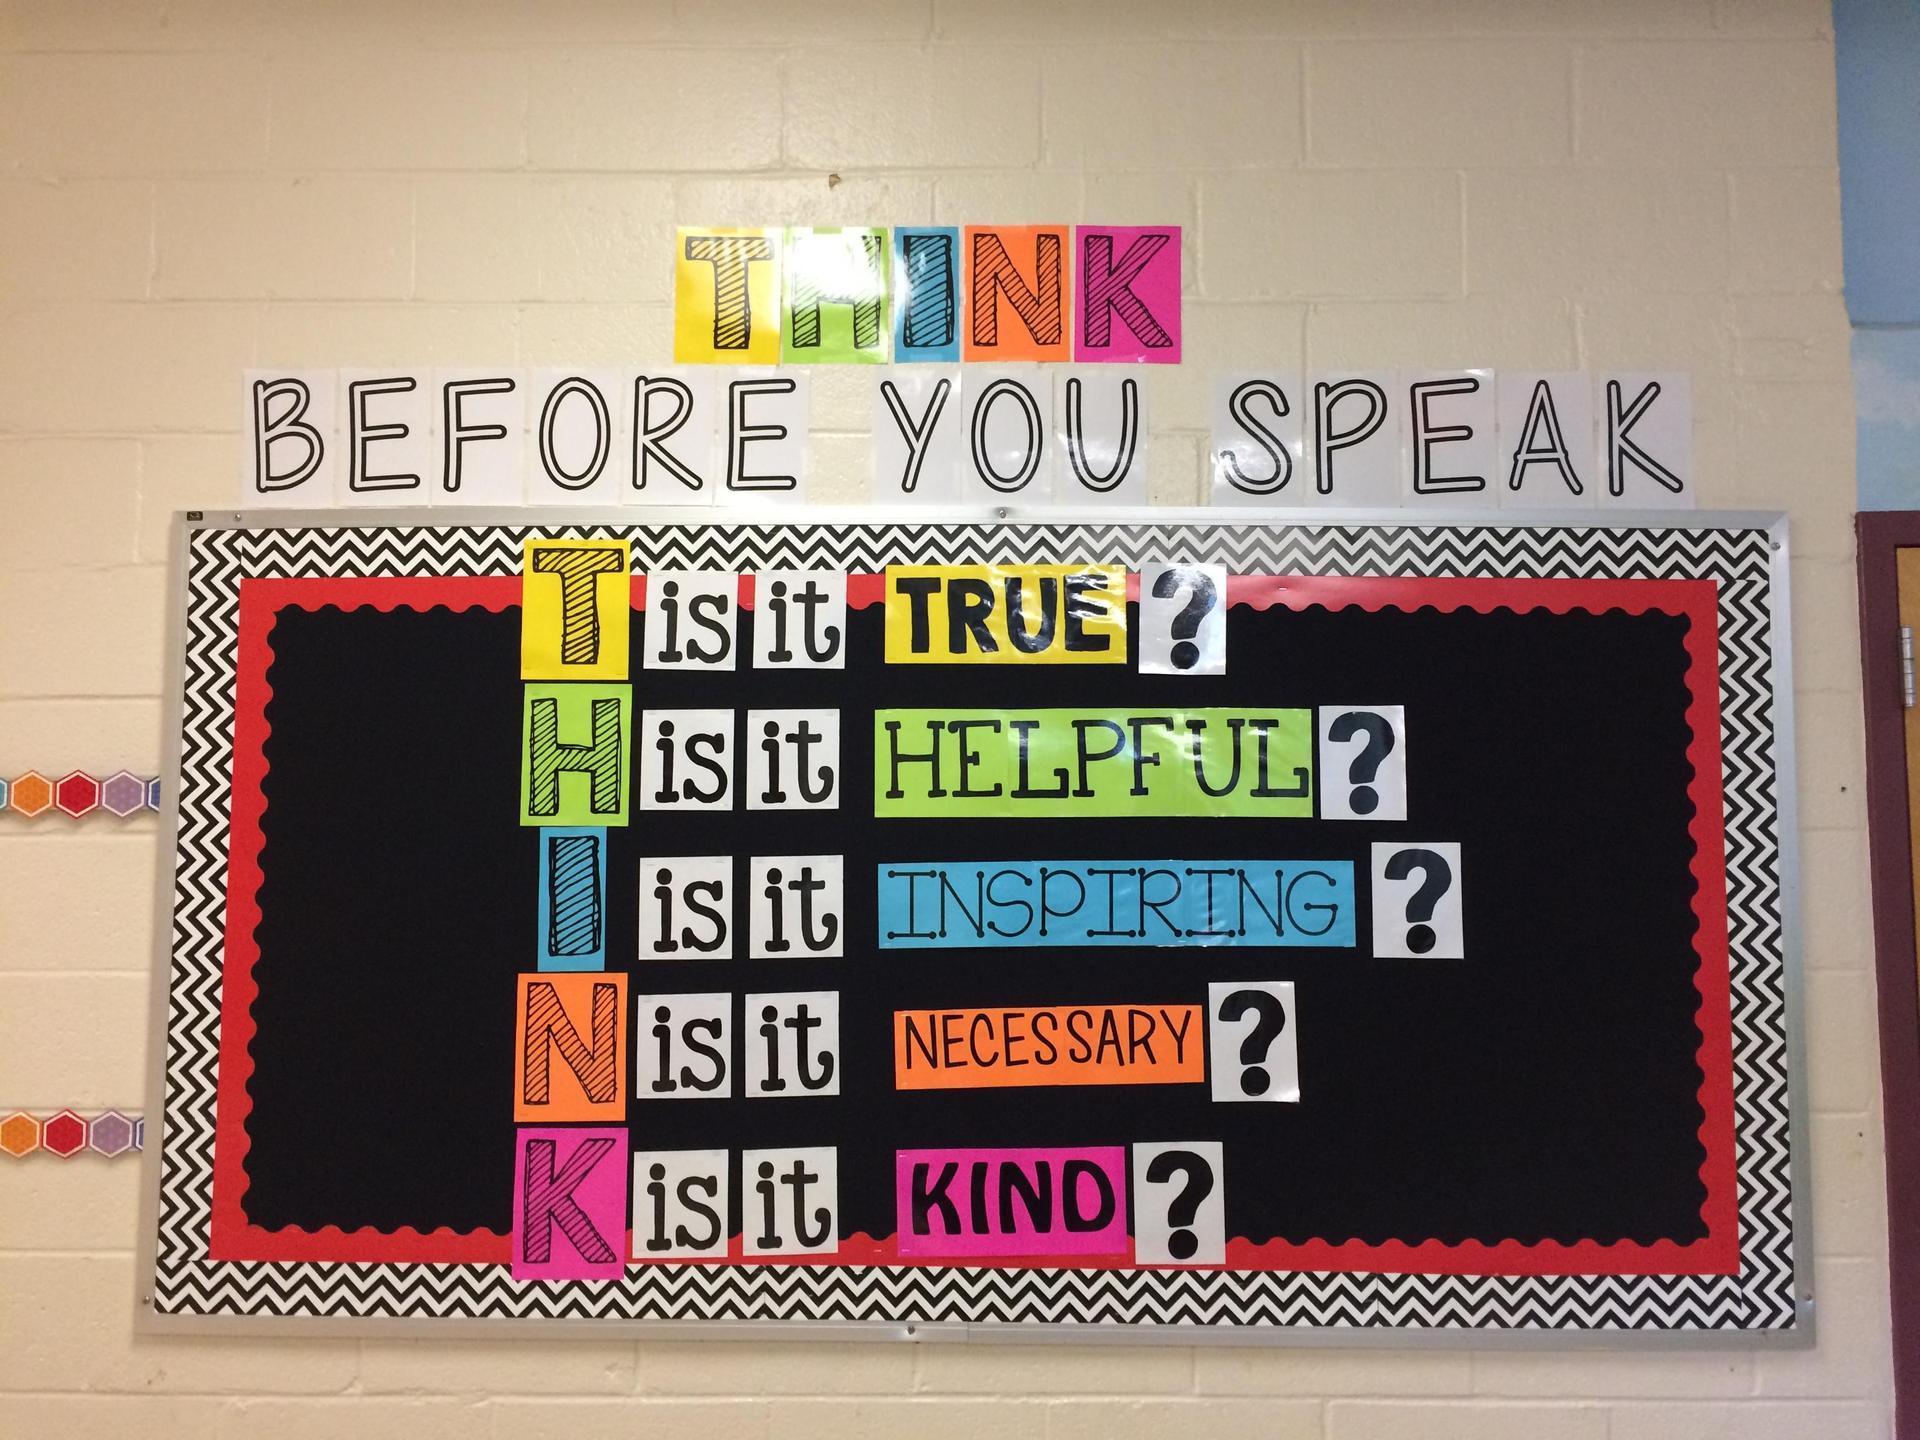 Think before you speak bulliten board